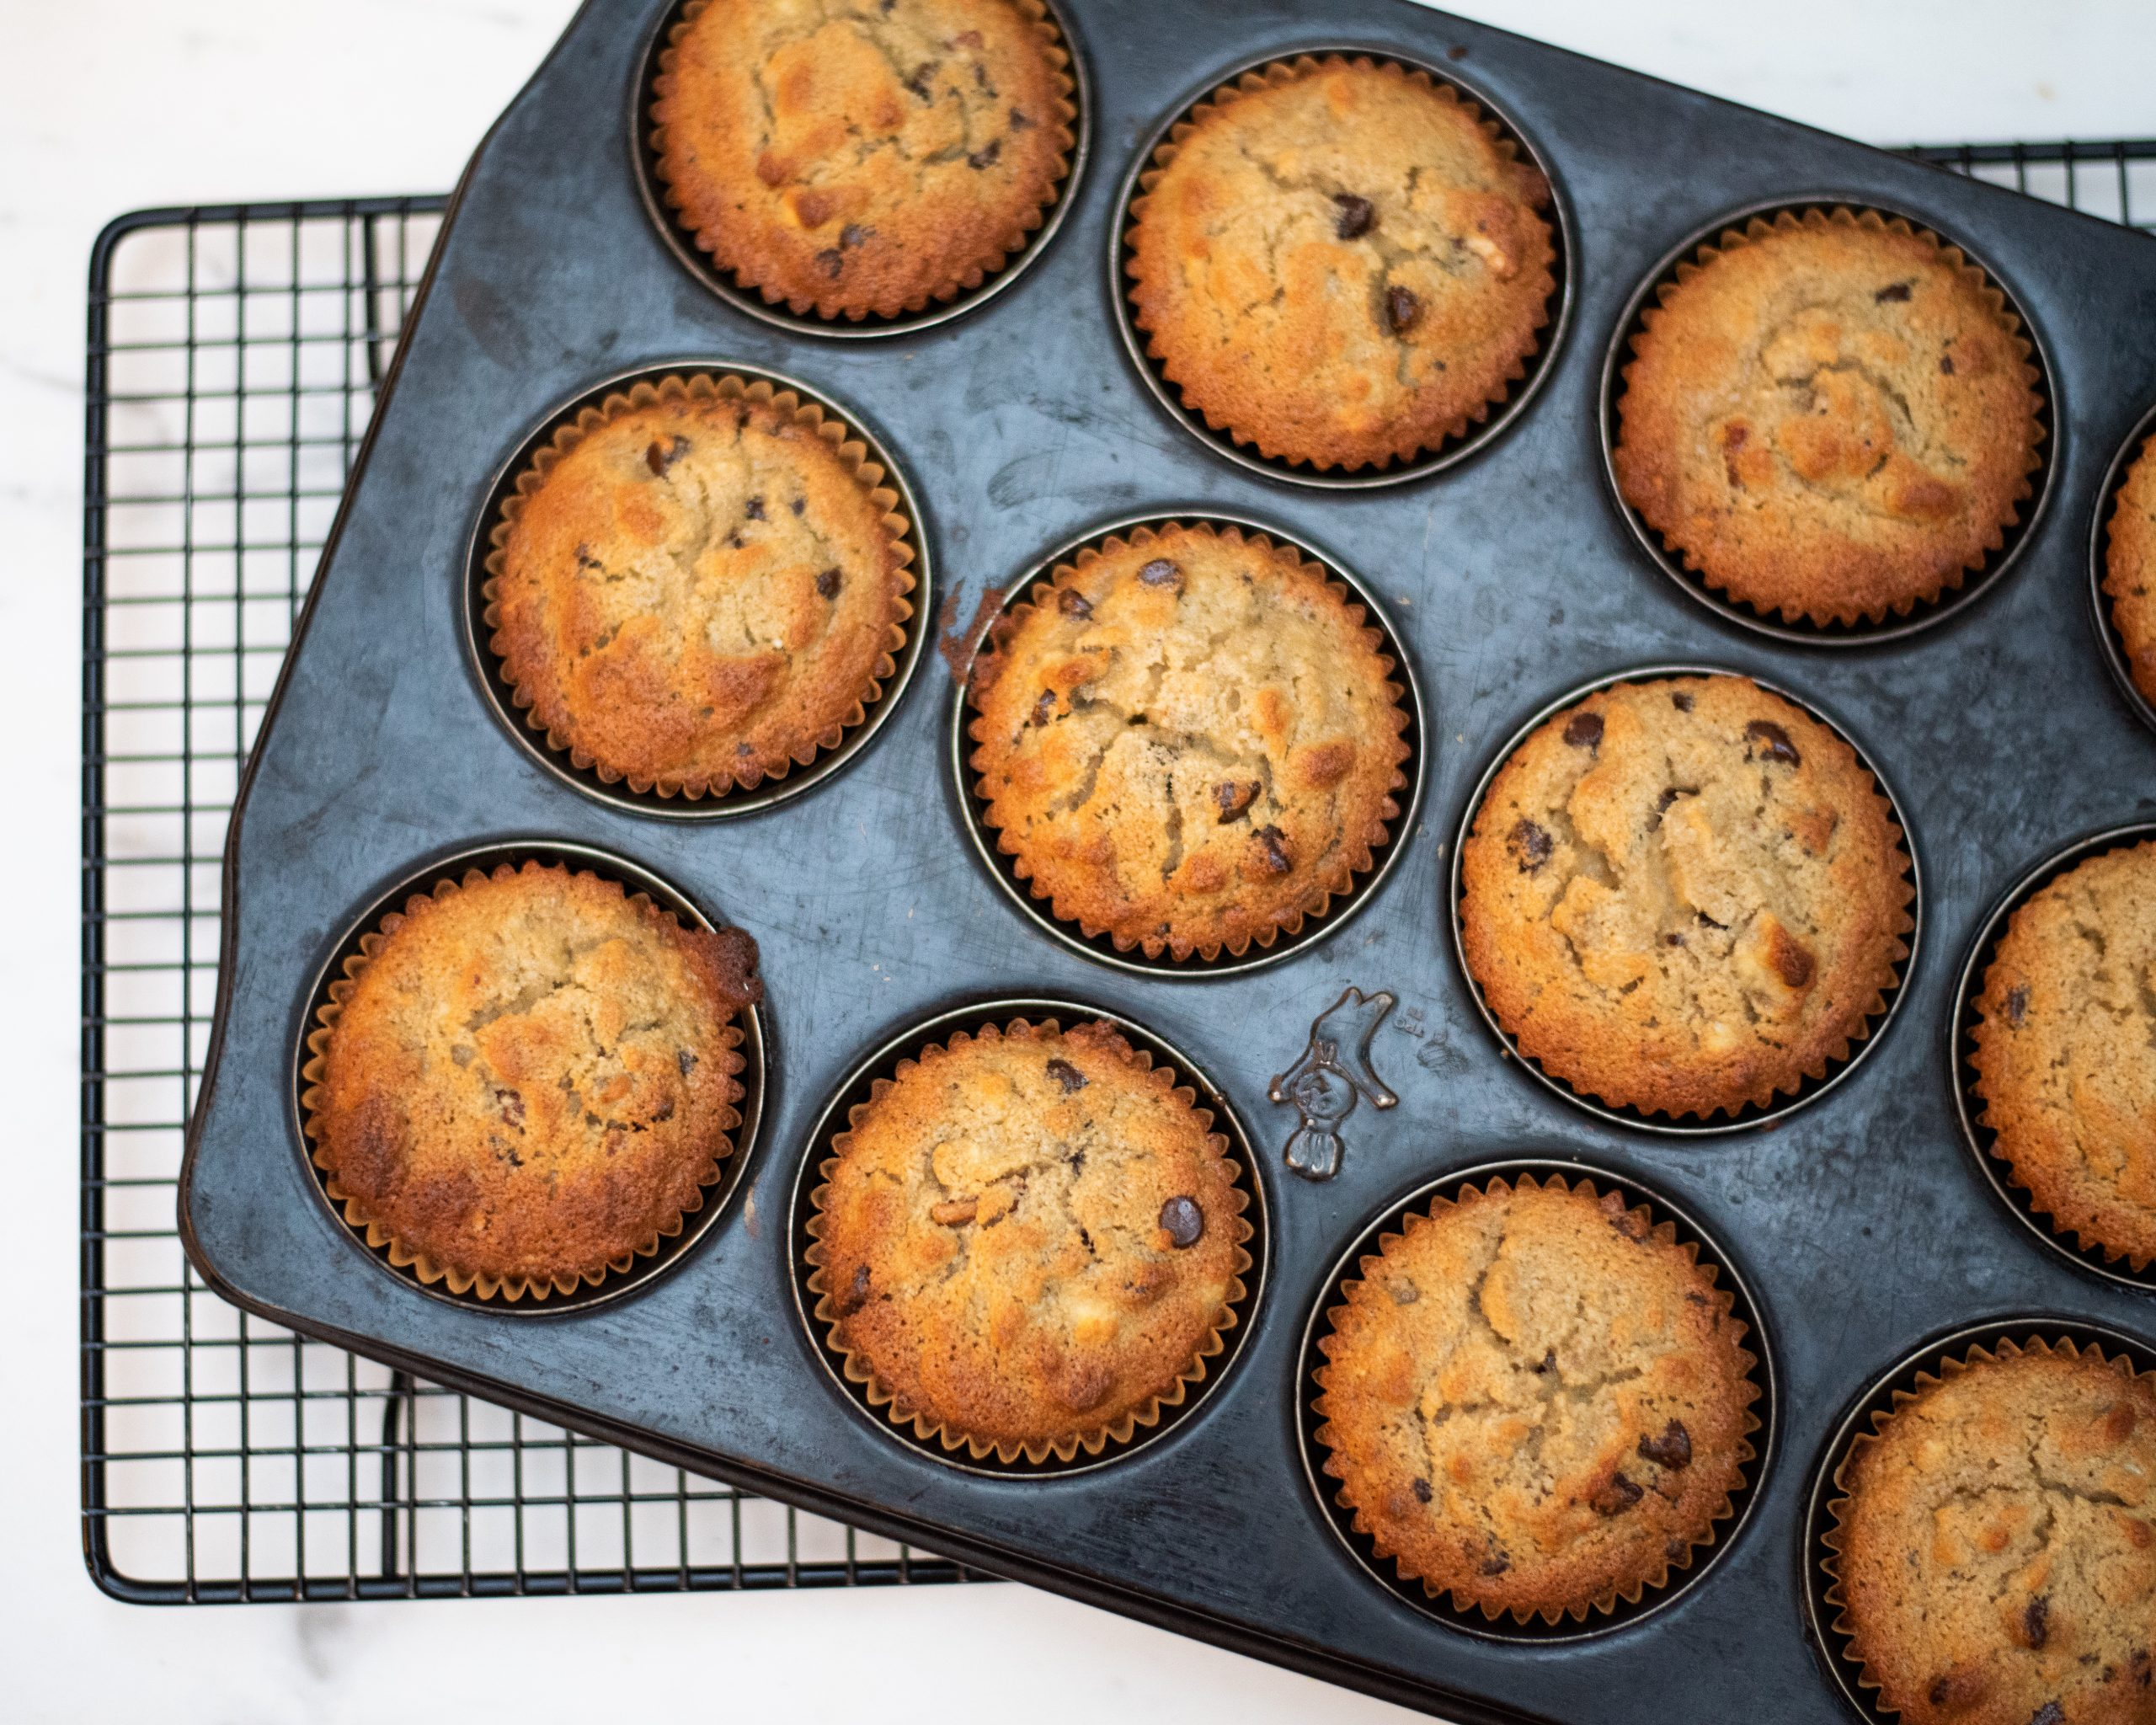 Egg-free Banana Bread Muffins